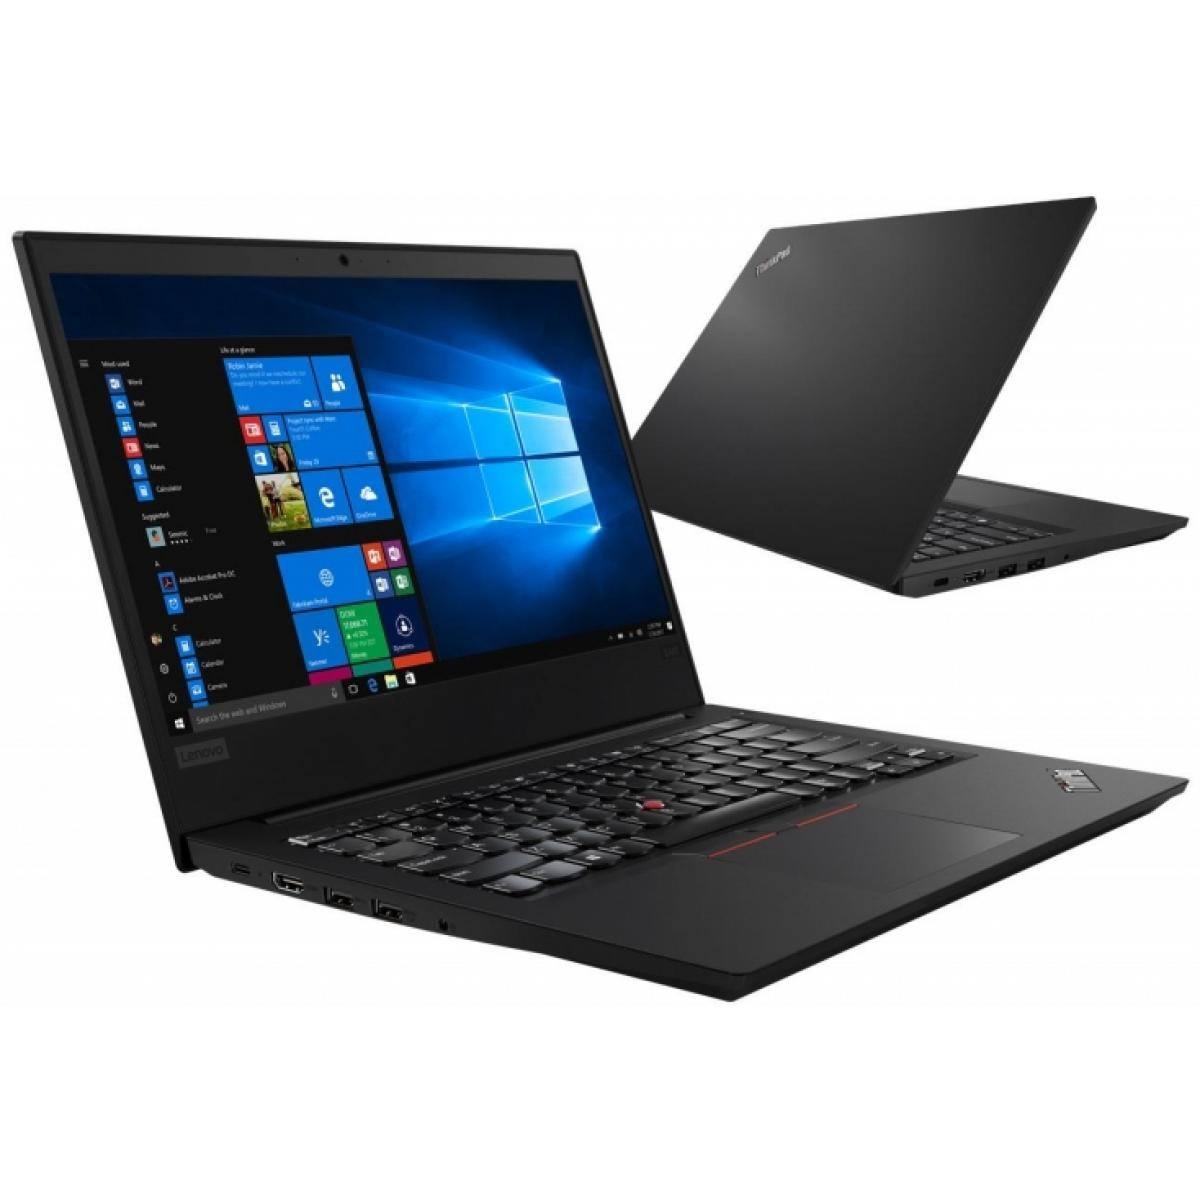 Lenovo ThinkPad E490s - 20NGS01N00